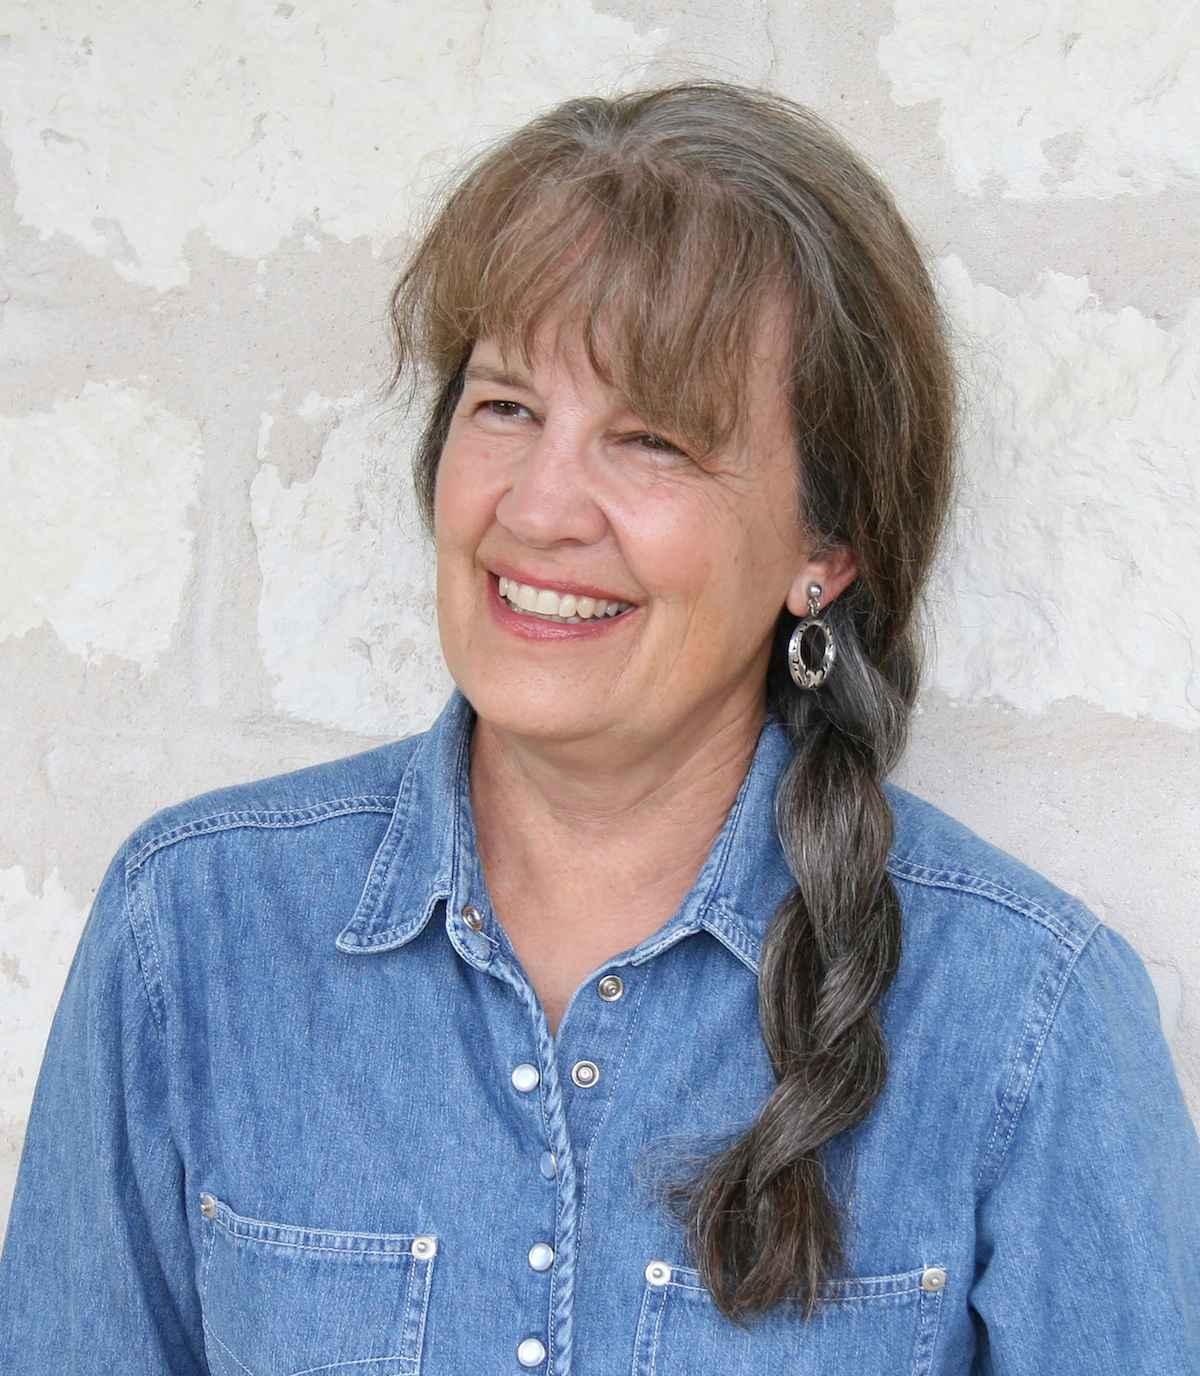 Tamara Rymer